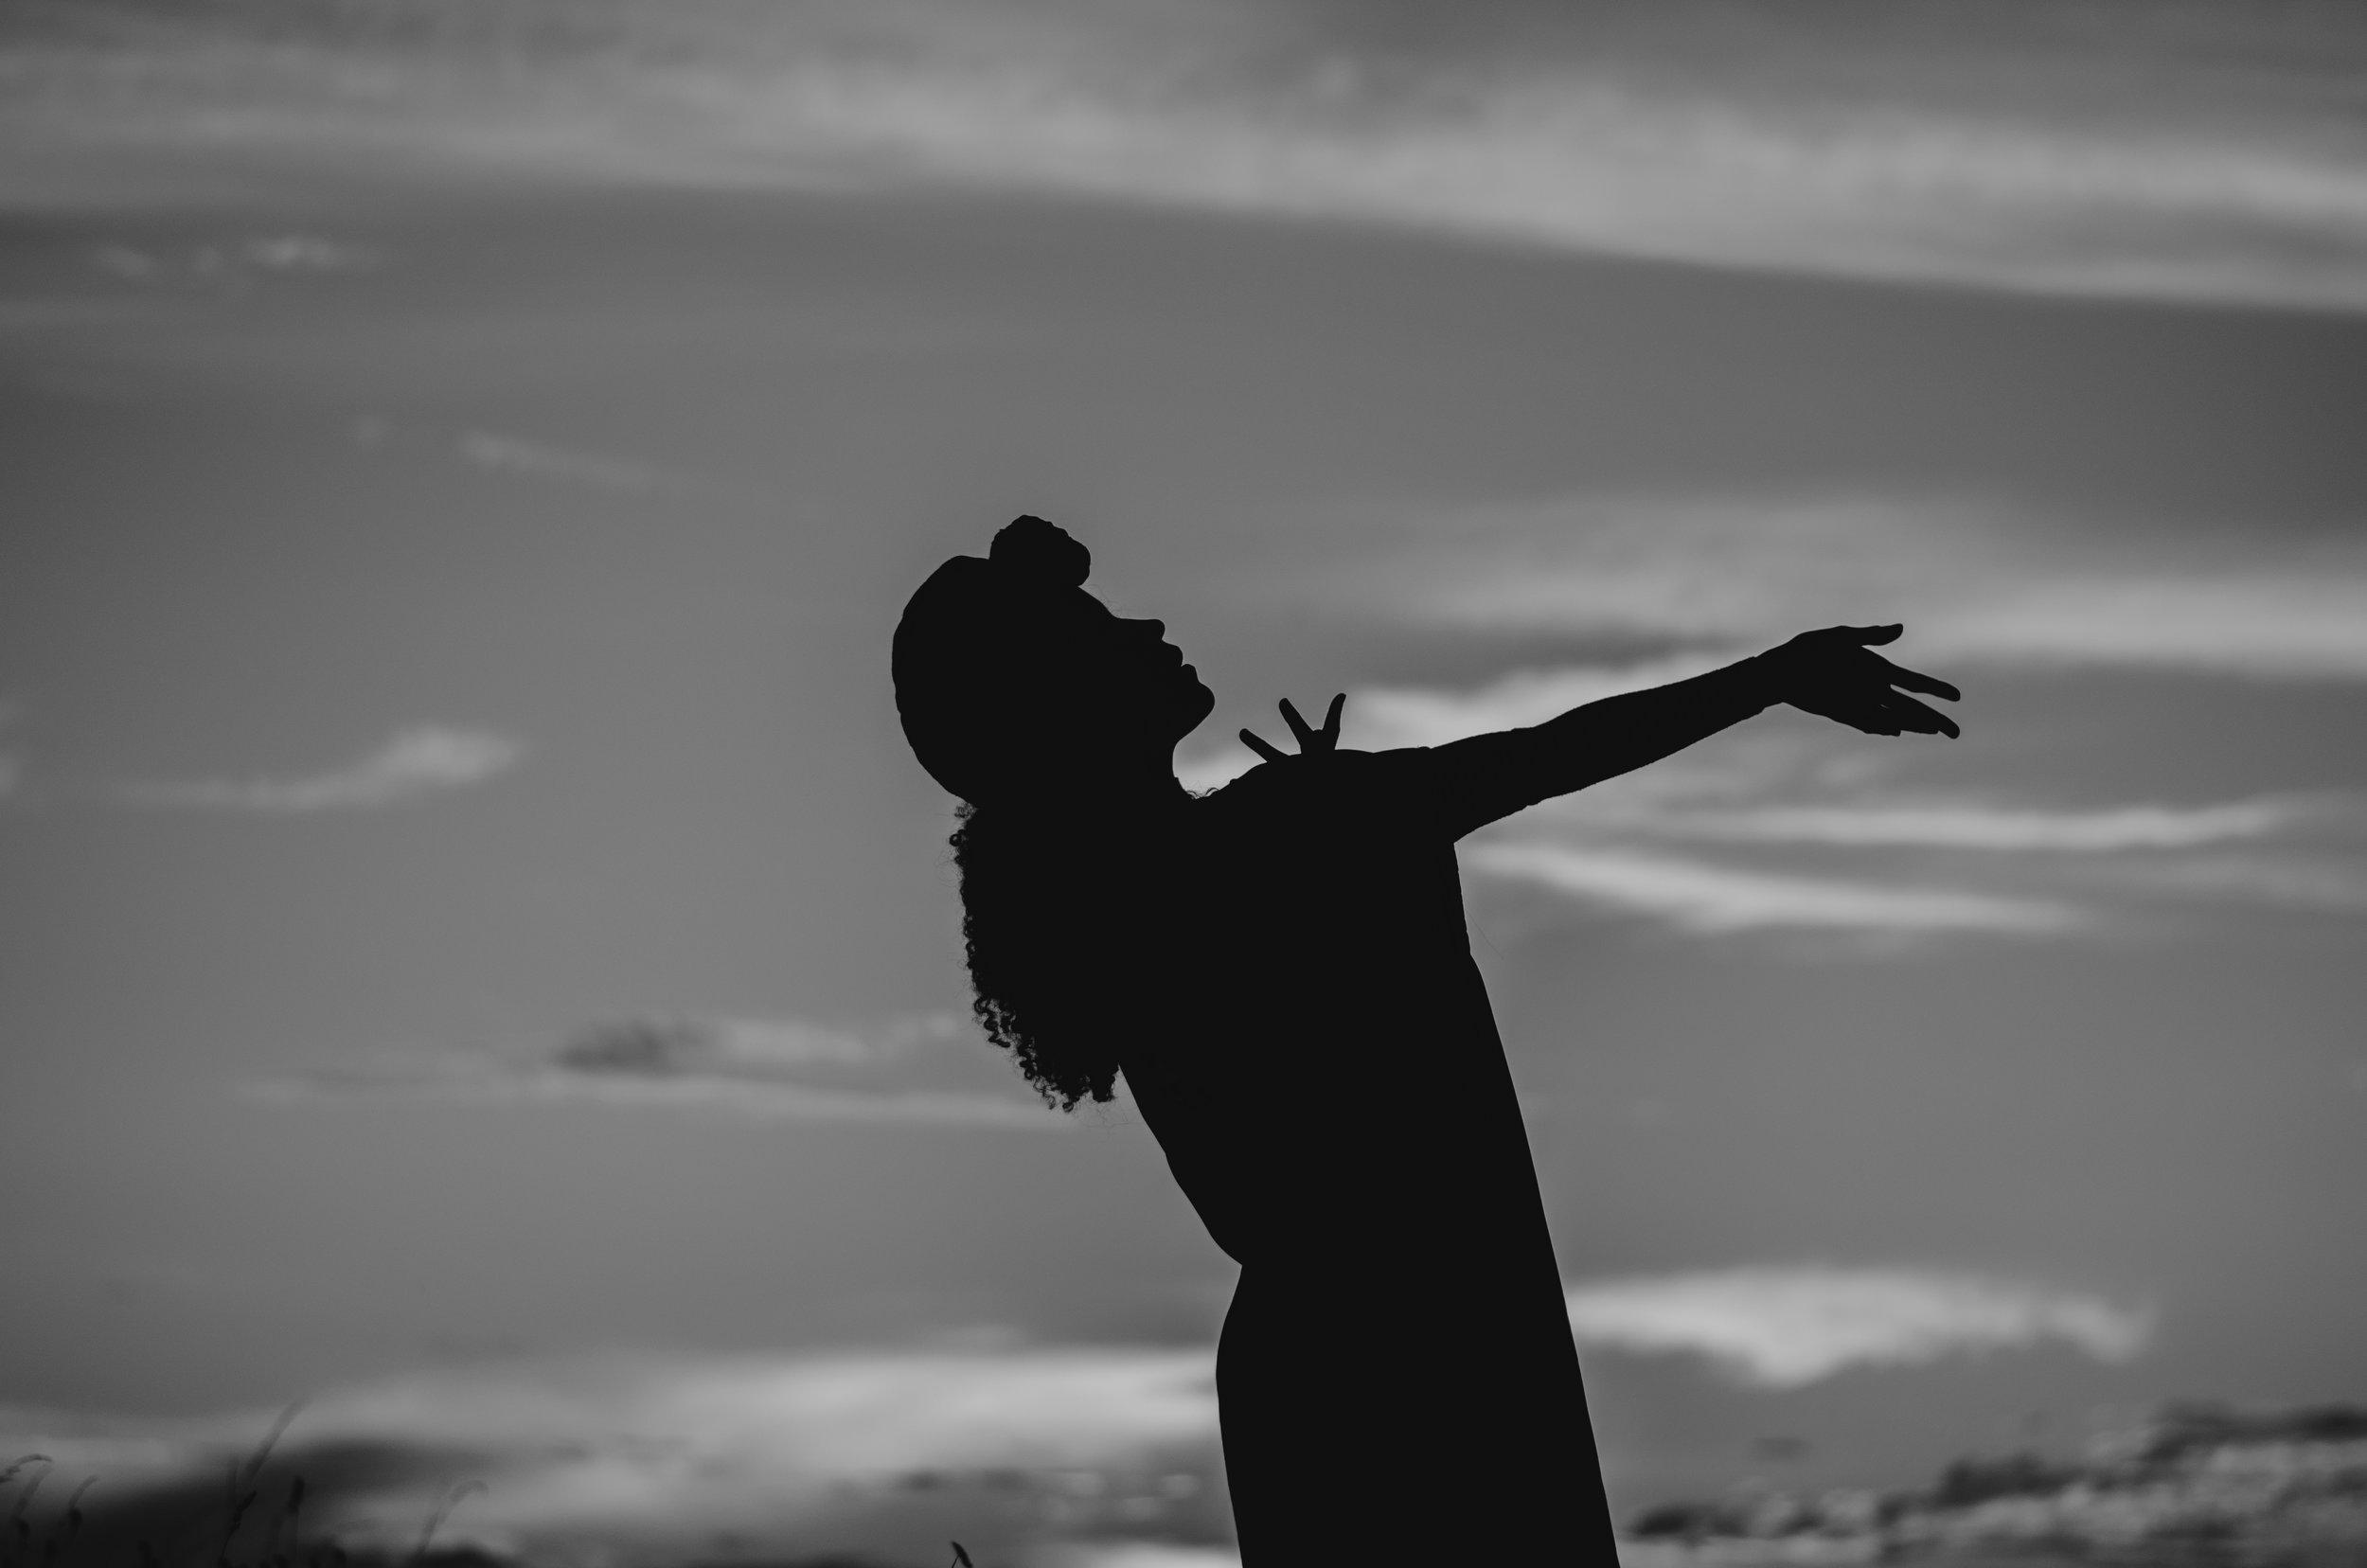 Inka-Portrait-Session-Aiste-Saulyte-Photography-17-07-30-572.jpg